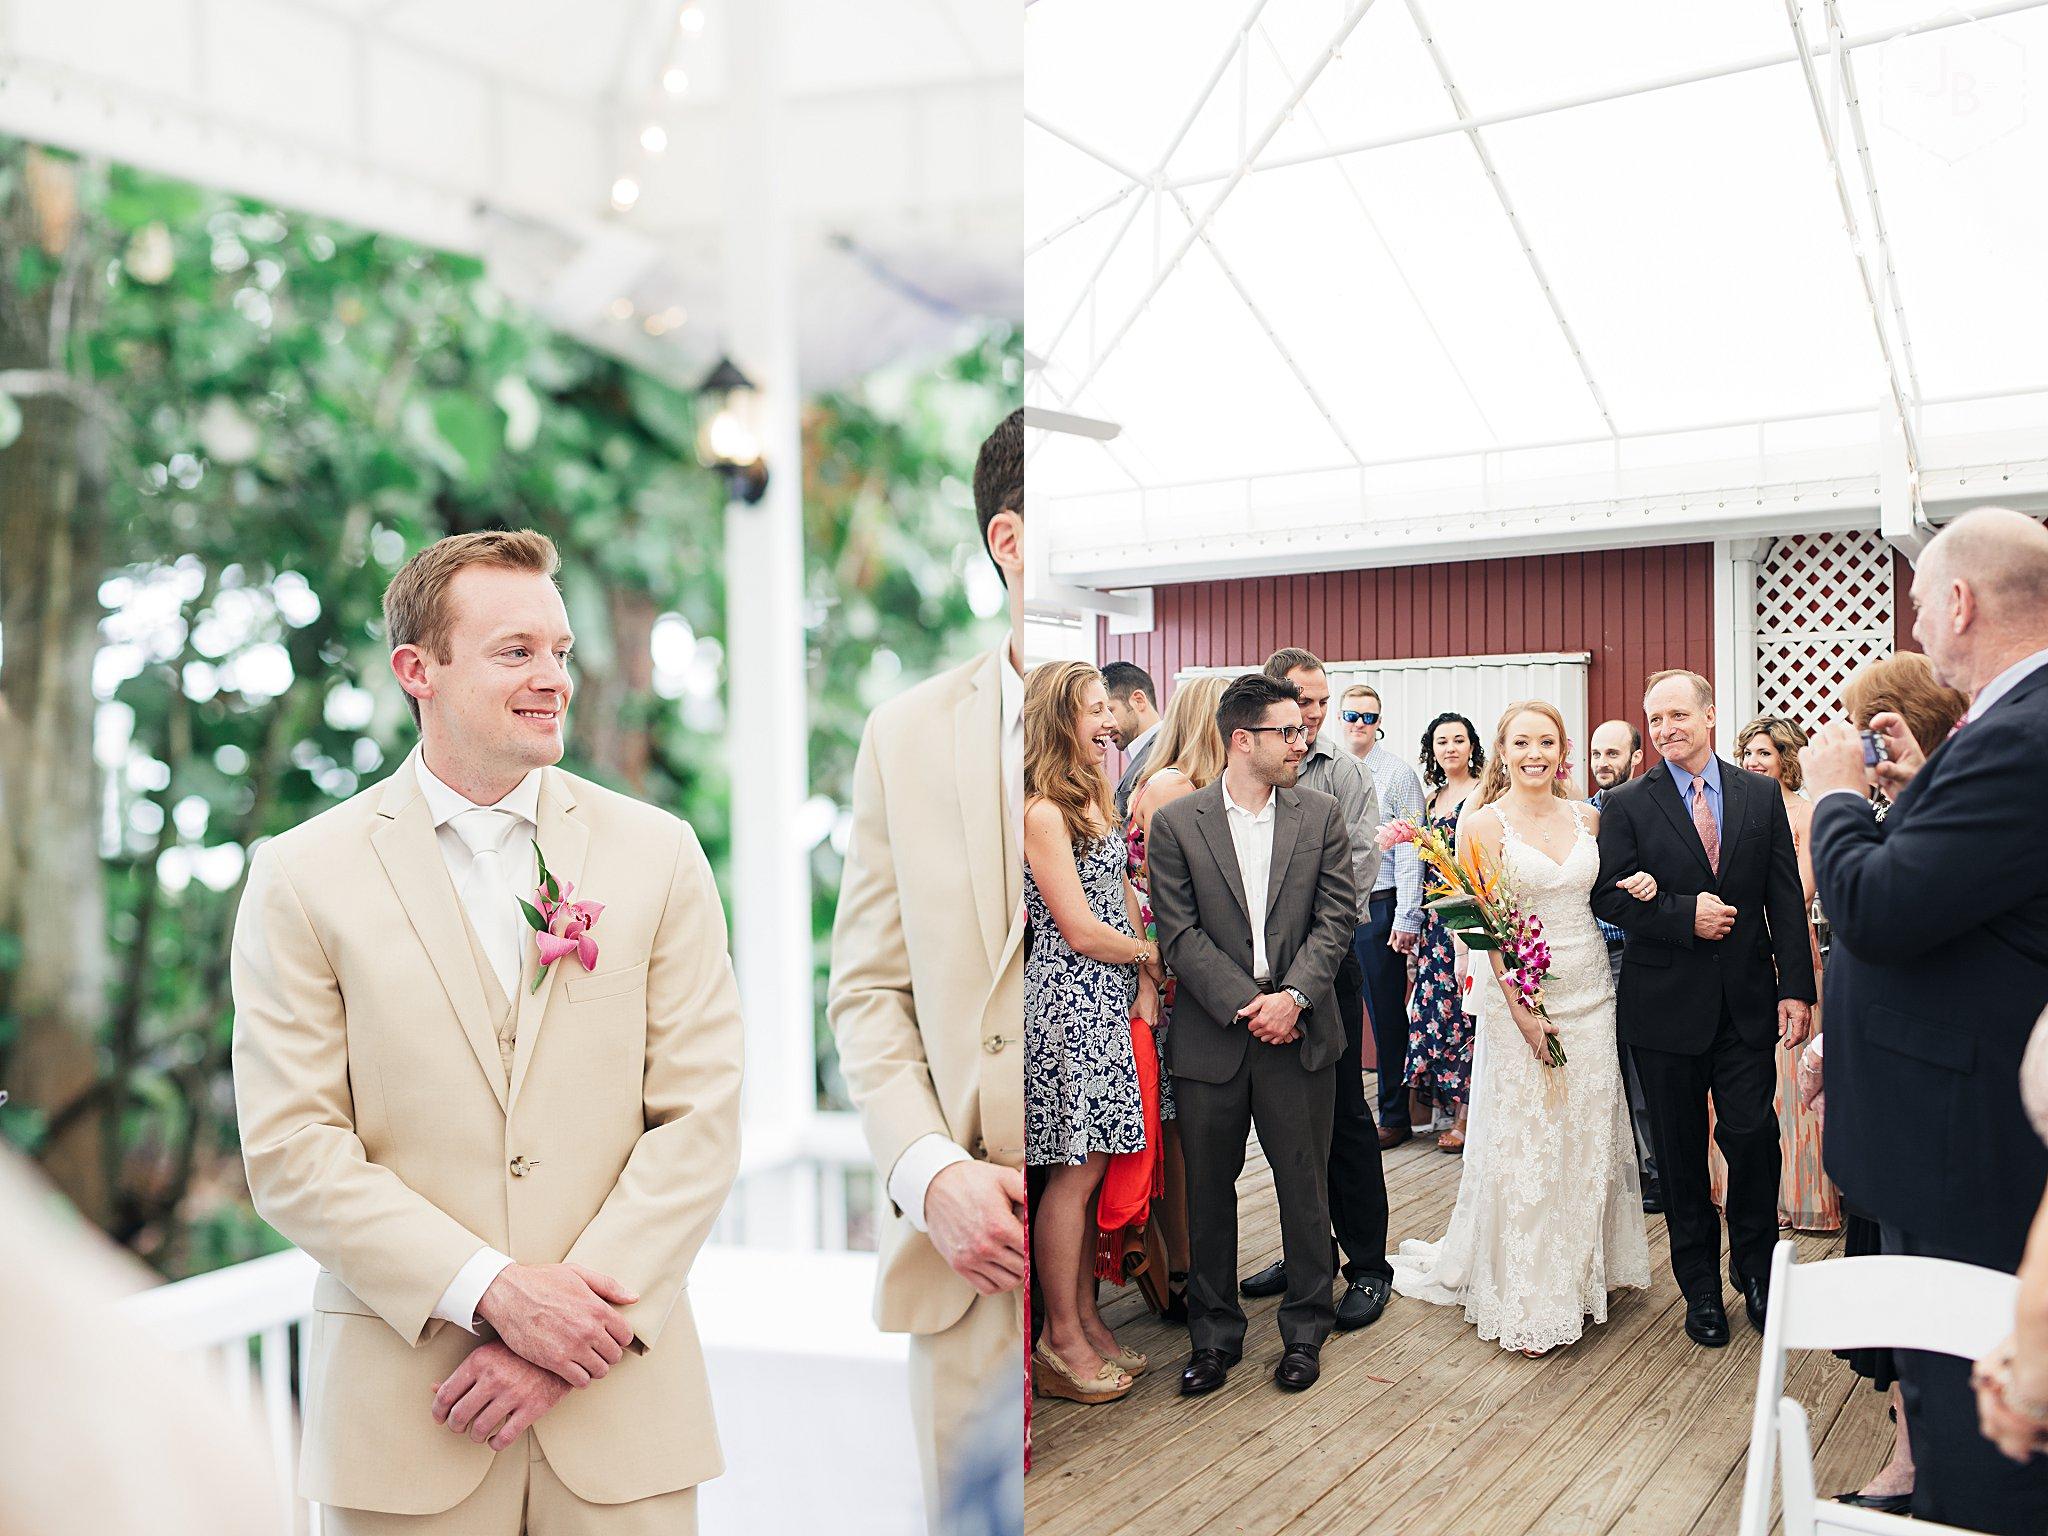 WeddingandEngagementFloridaPhotographer_2049.jpg